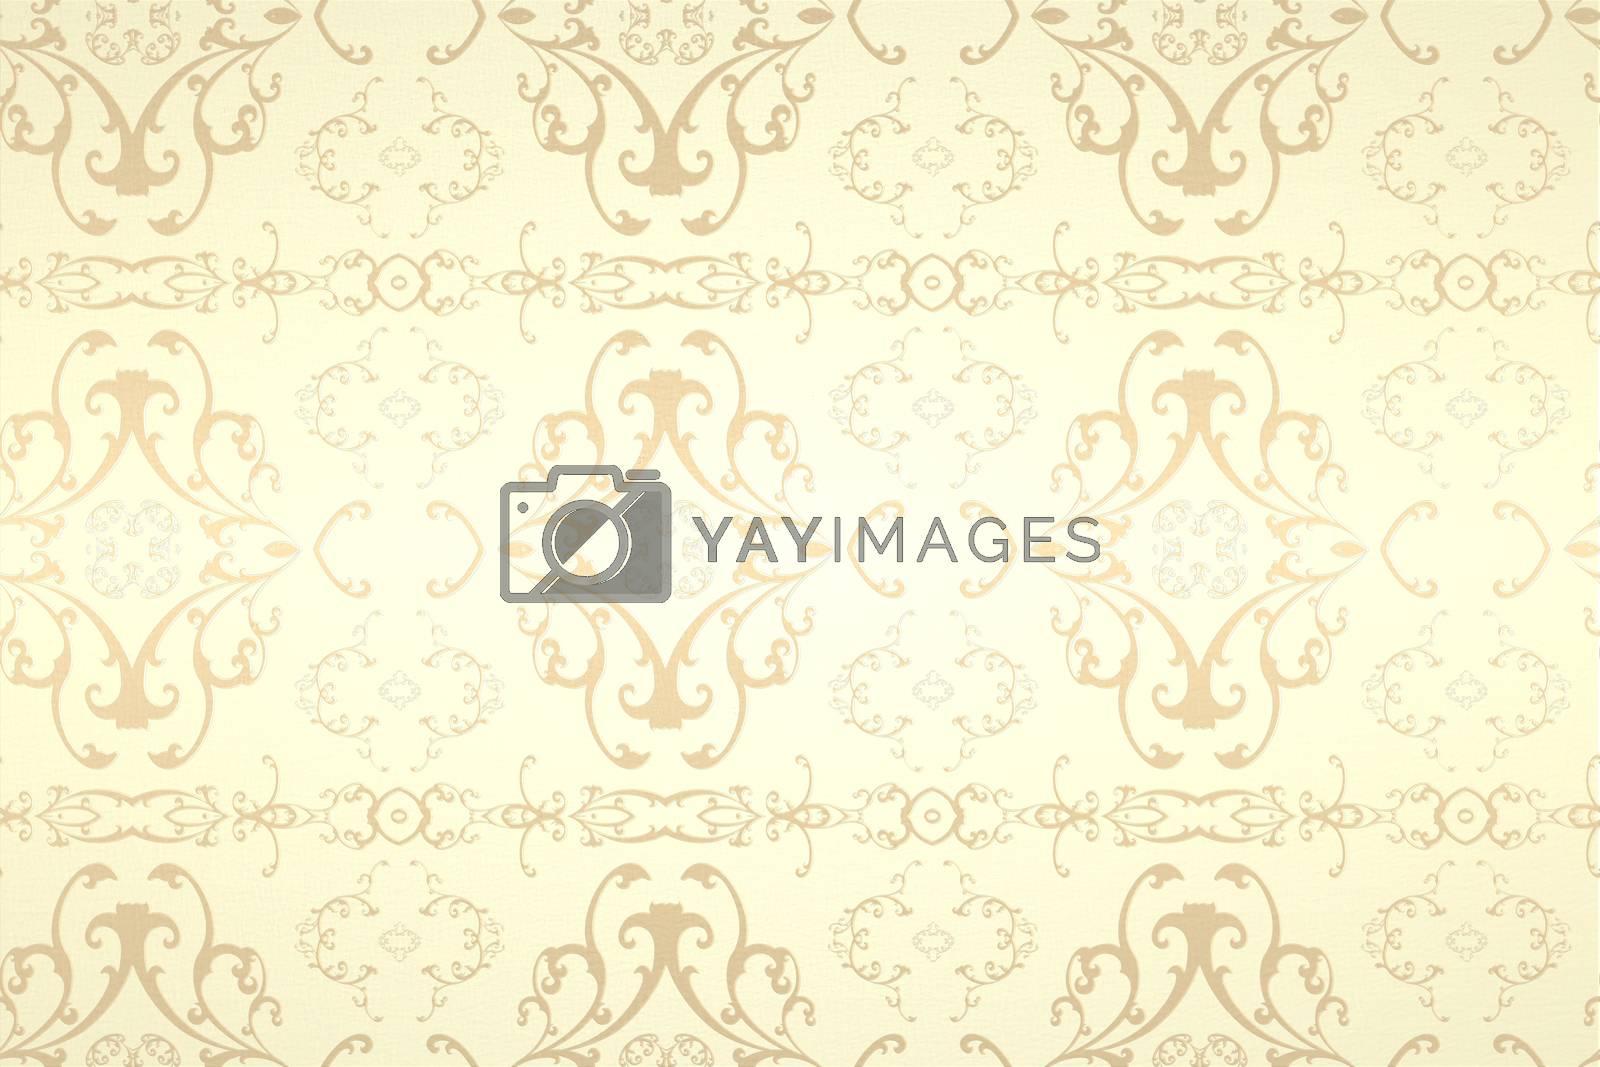 Royalty free image of Elegant patterned wallpaper in cream tones by Wavebreakmedia